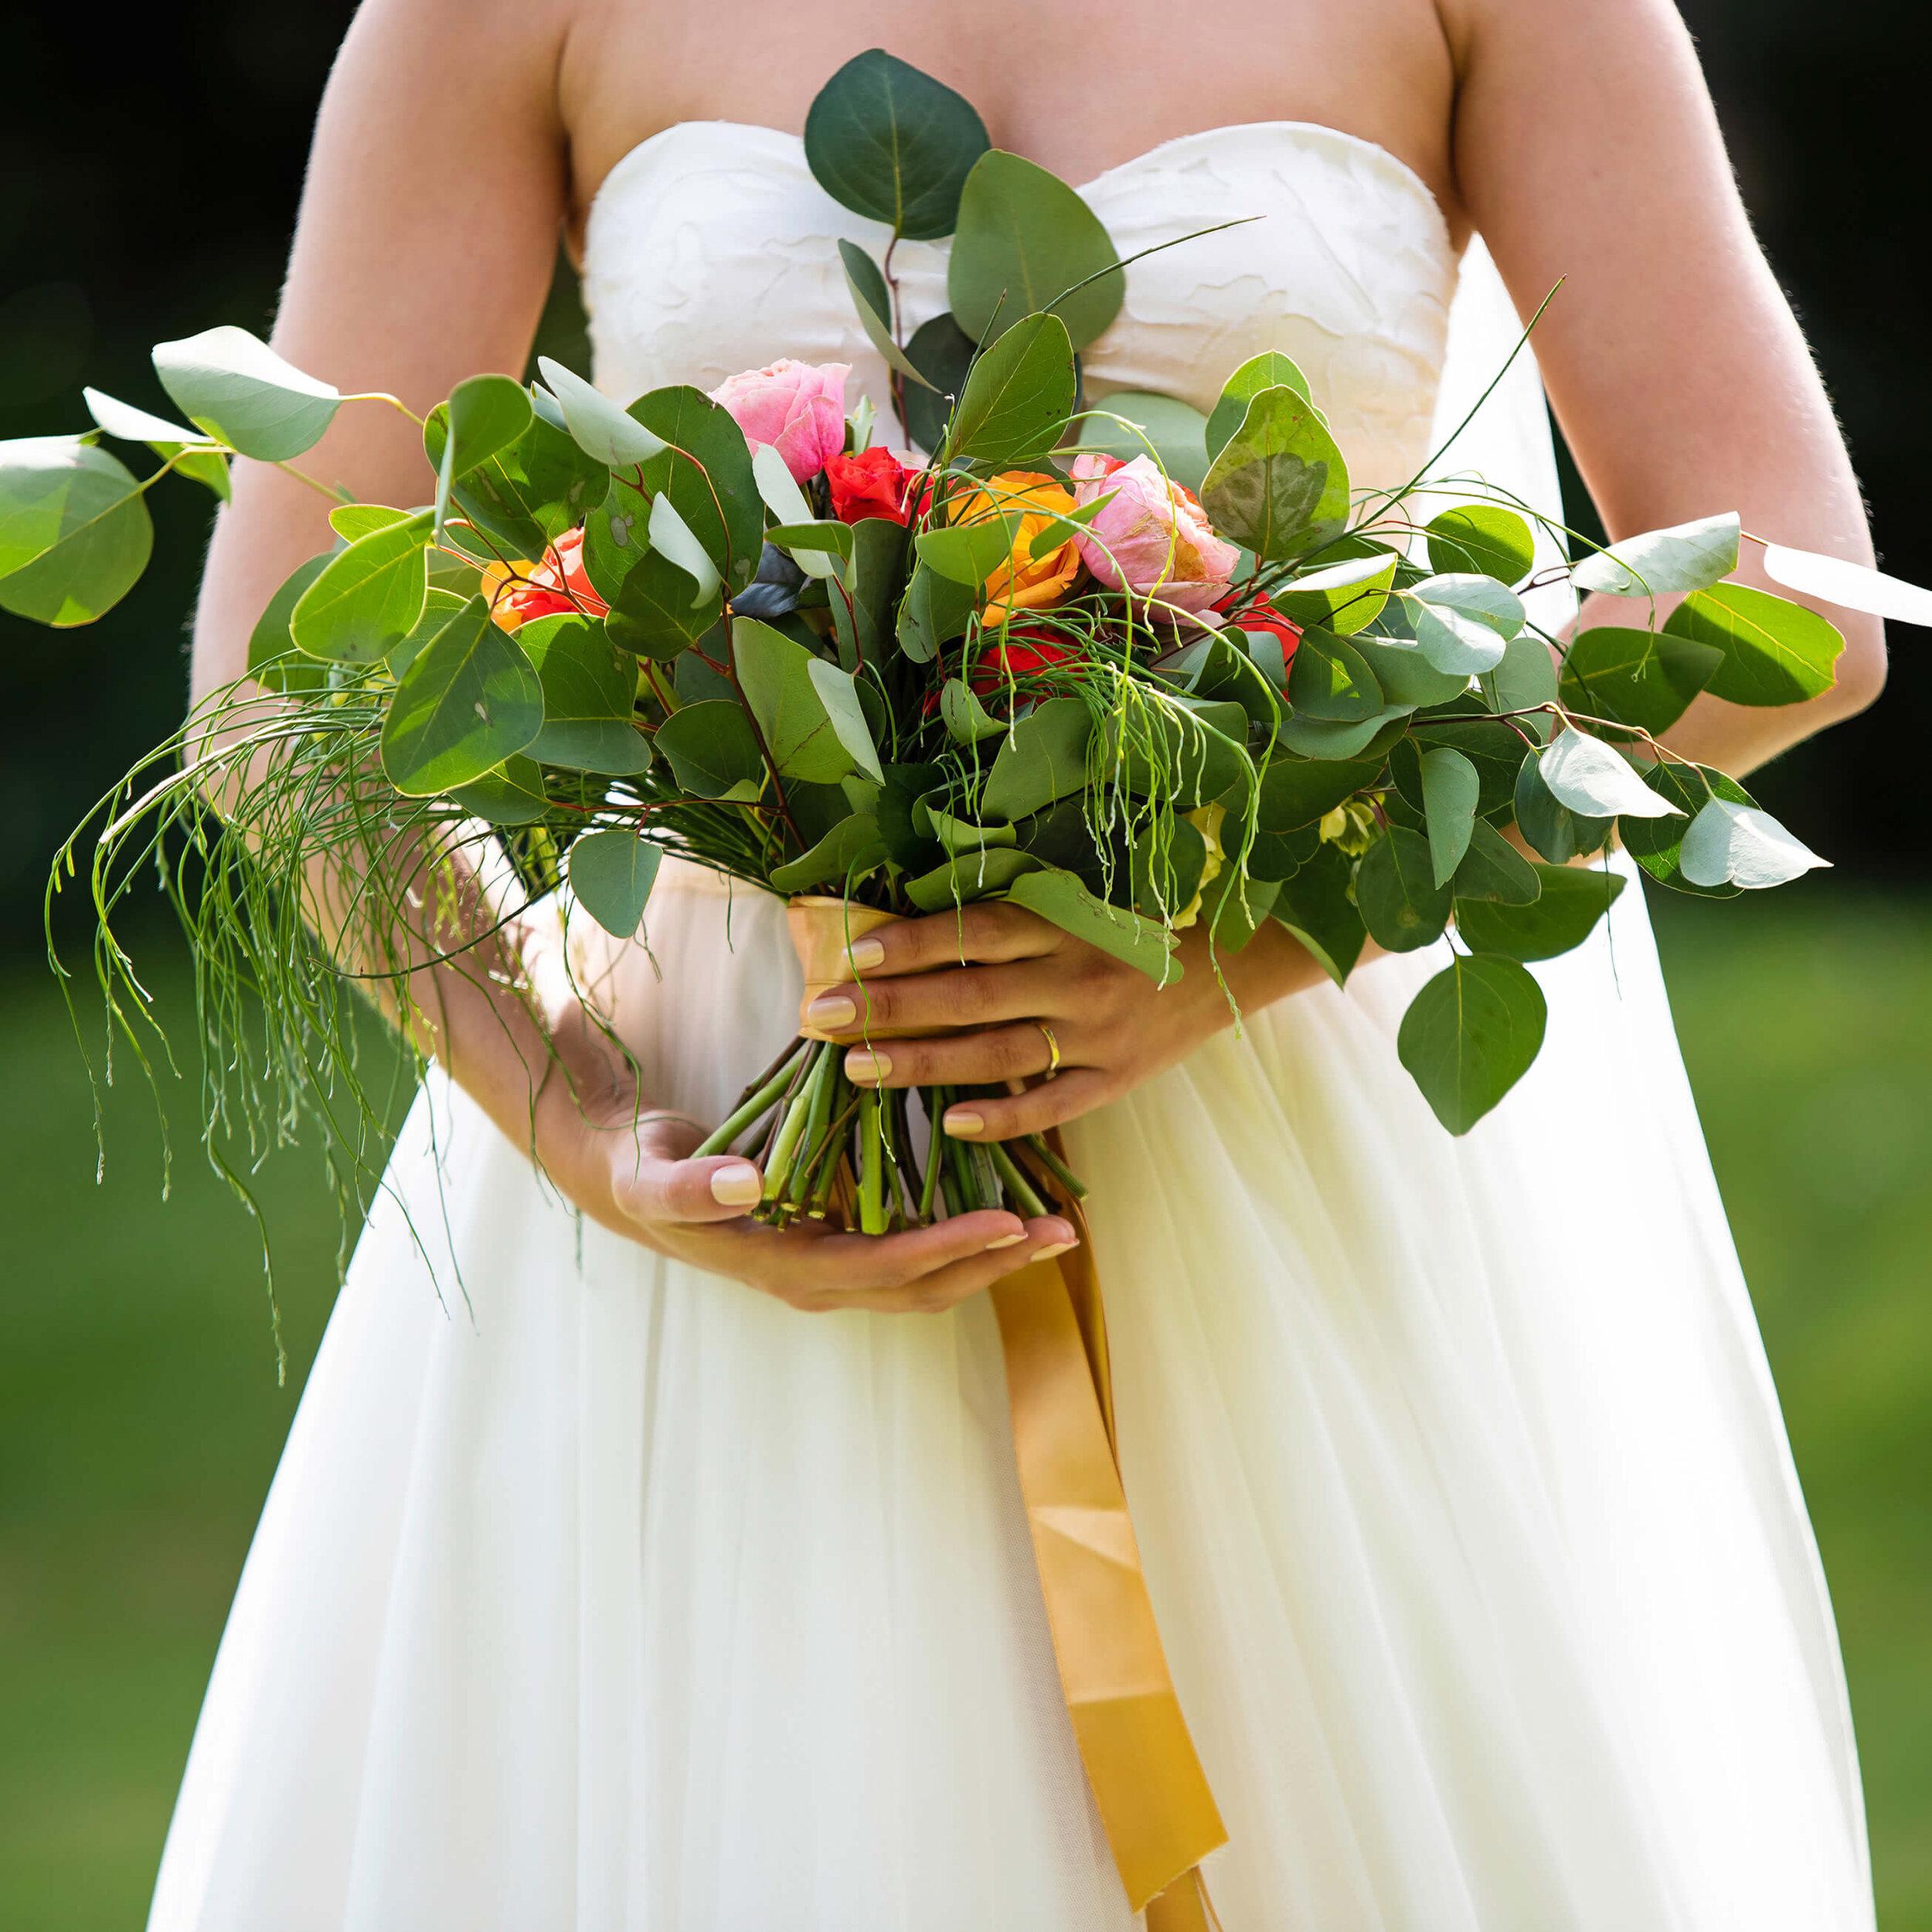 Bride with Davina Simone Weddings floral and foliage bouquet at Nurstead Court Wedding Venue, Kent.